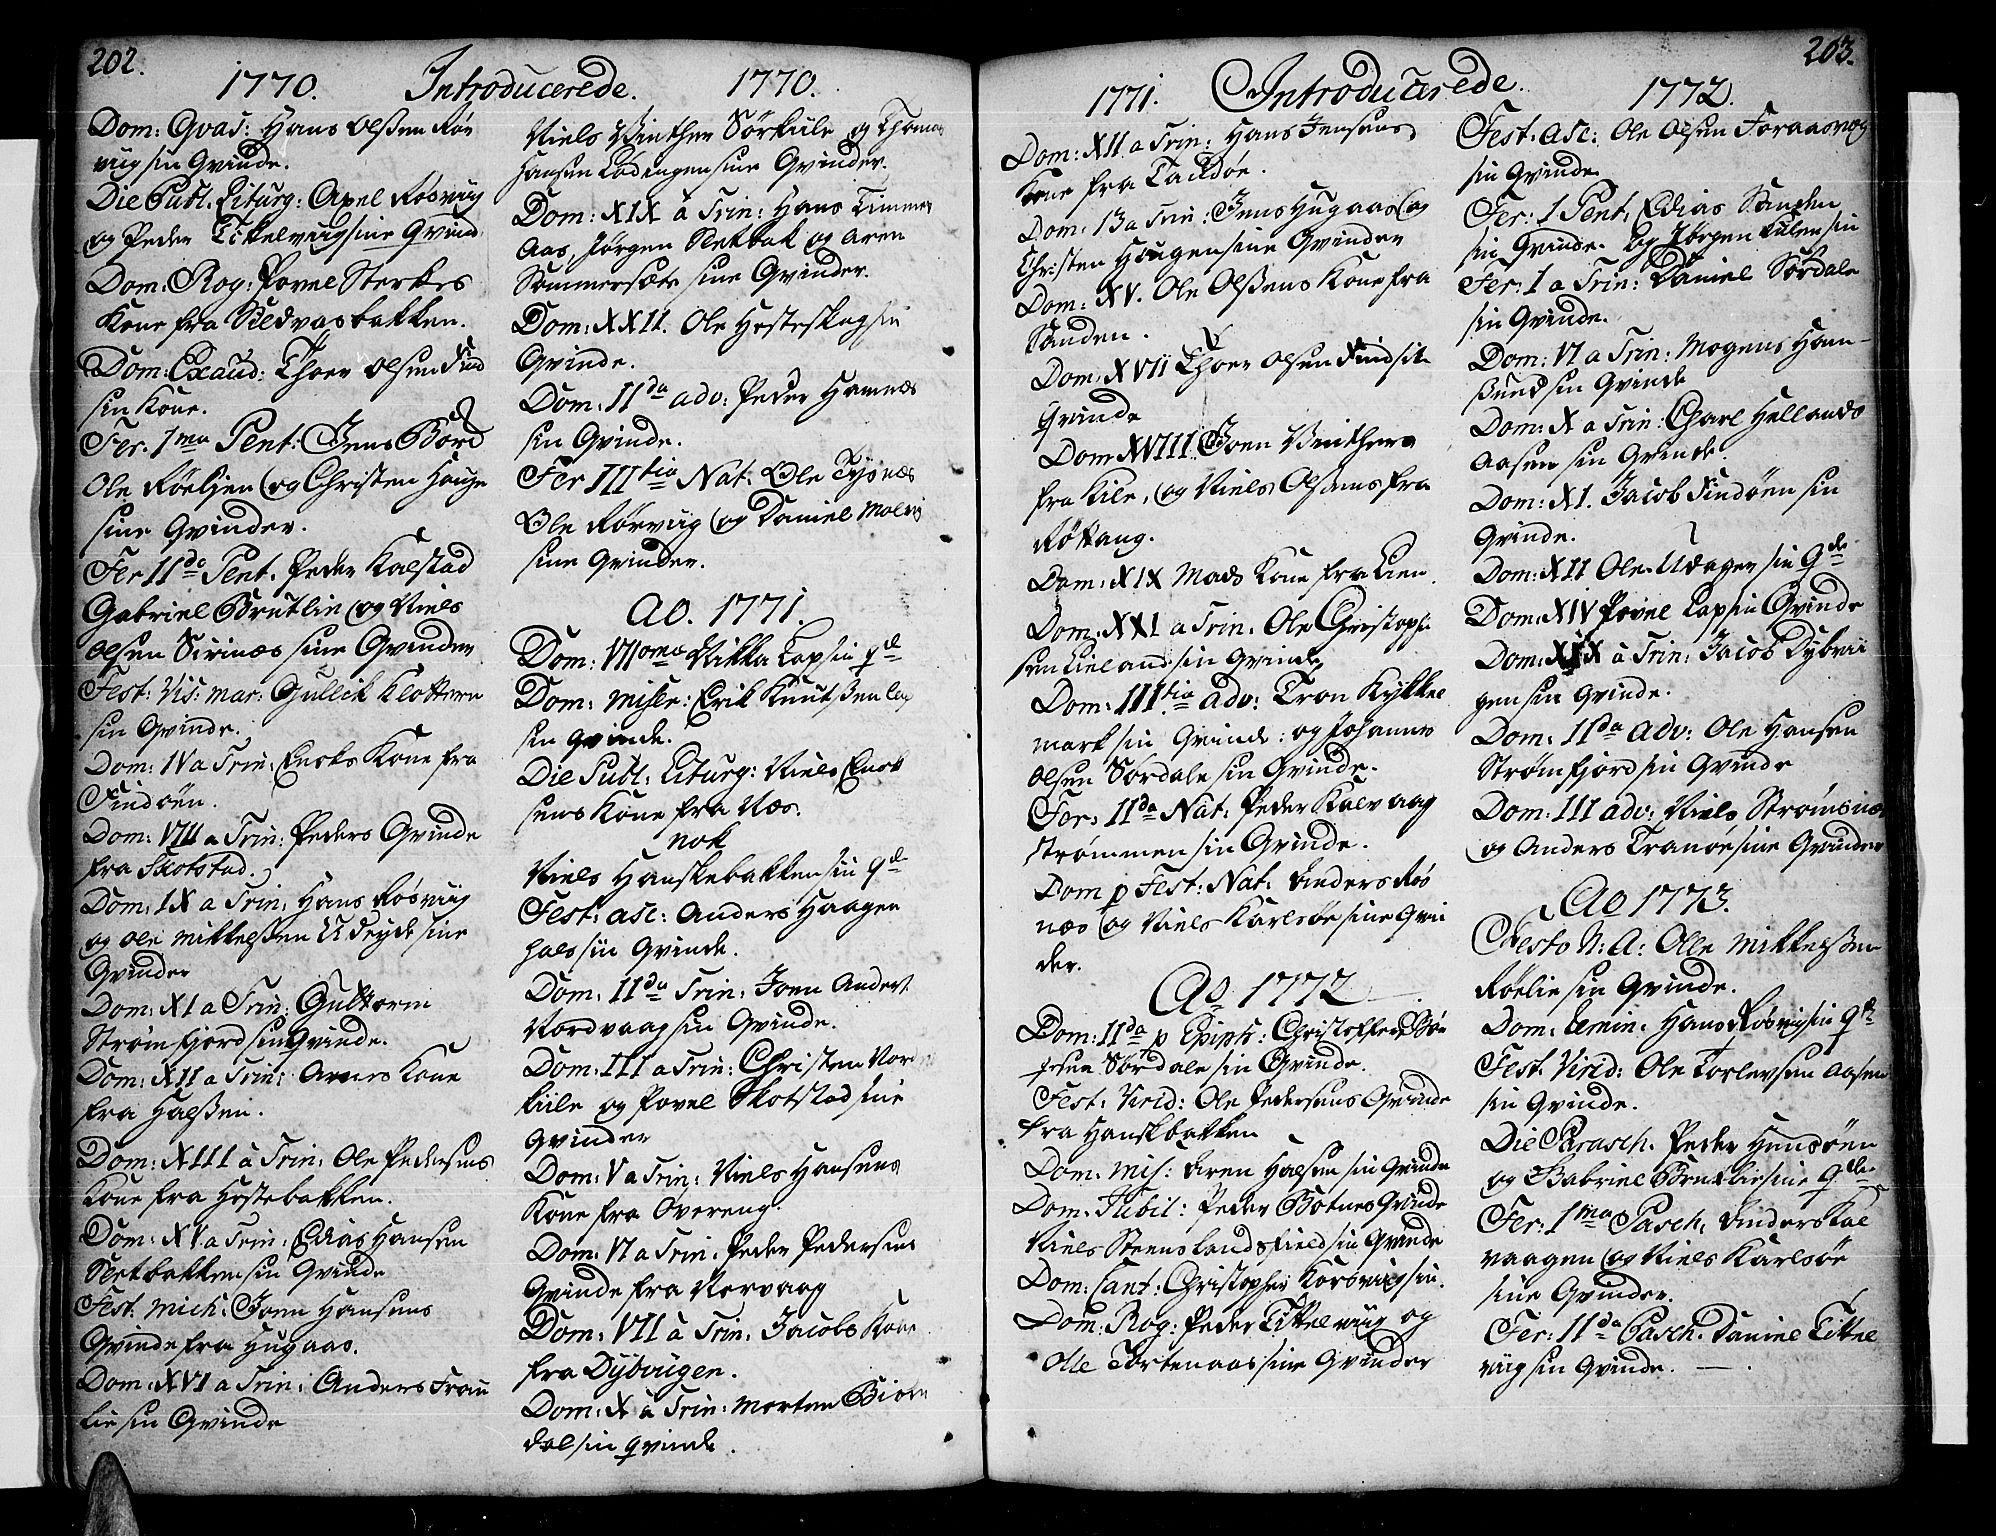 SAT, Ministerialprotokoller, klokkerbøker og fødselsregistre - Nordland, 859/L0841: Ministerialbok nr. 859A01, 1766-1821, s. 202-203